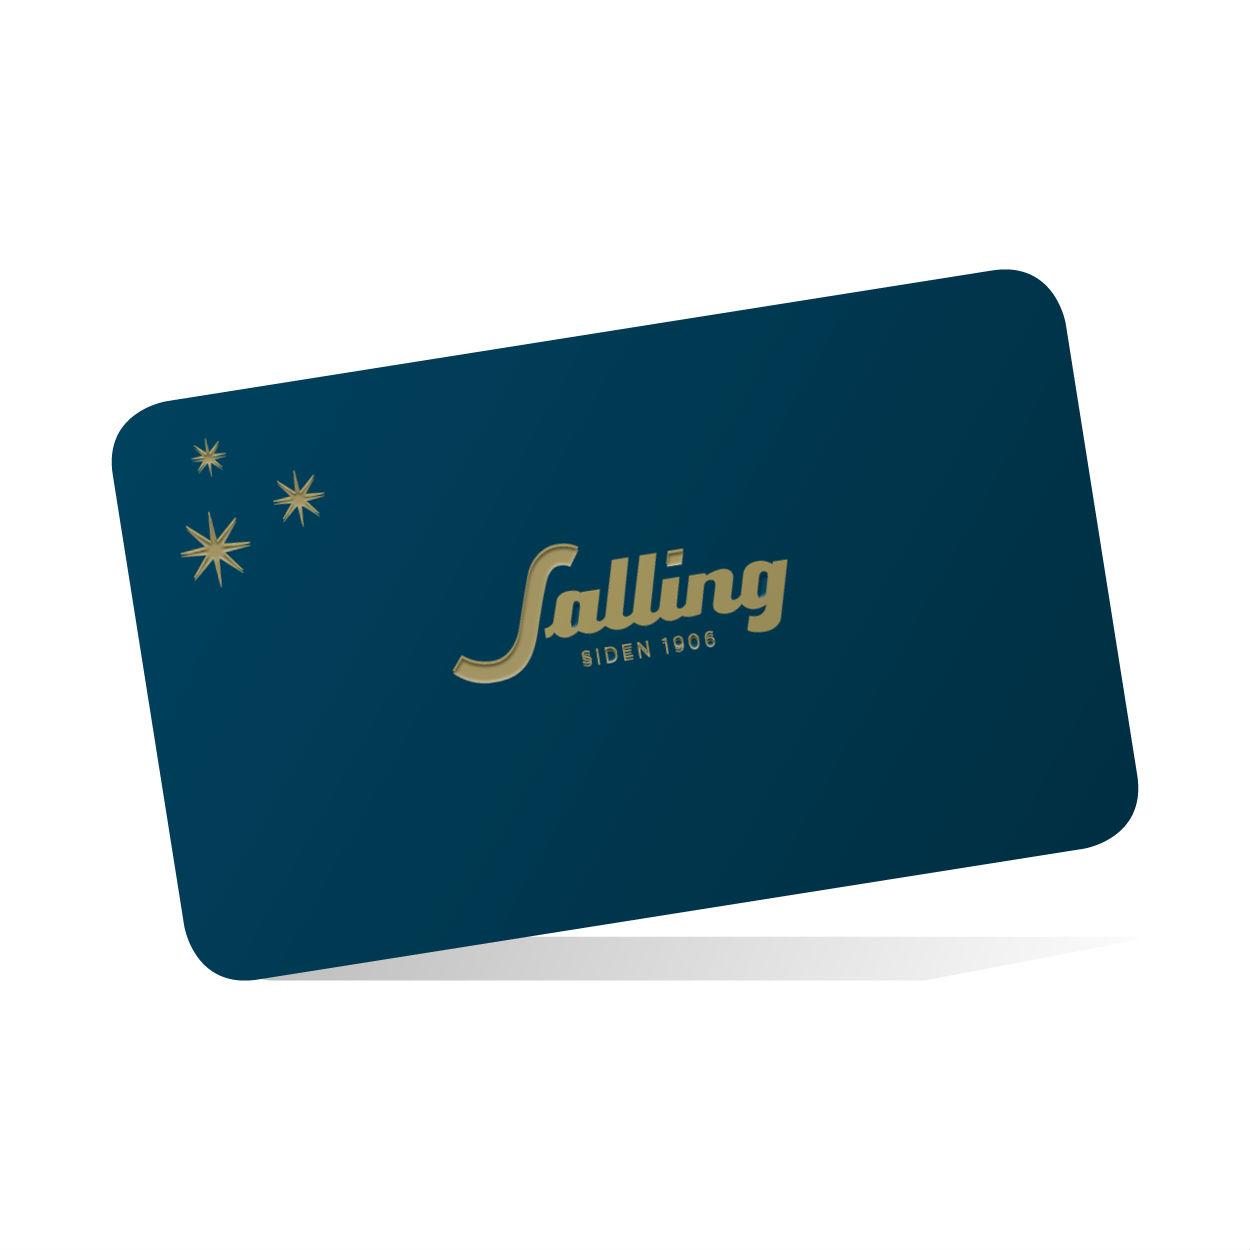 Salling gavekort - 250 kr